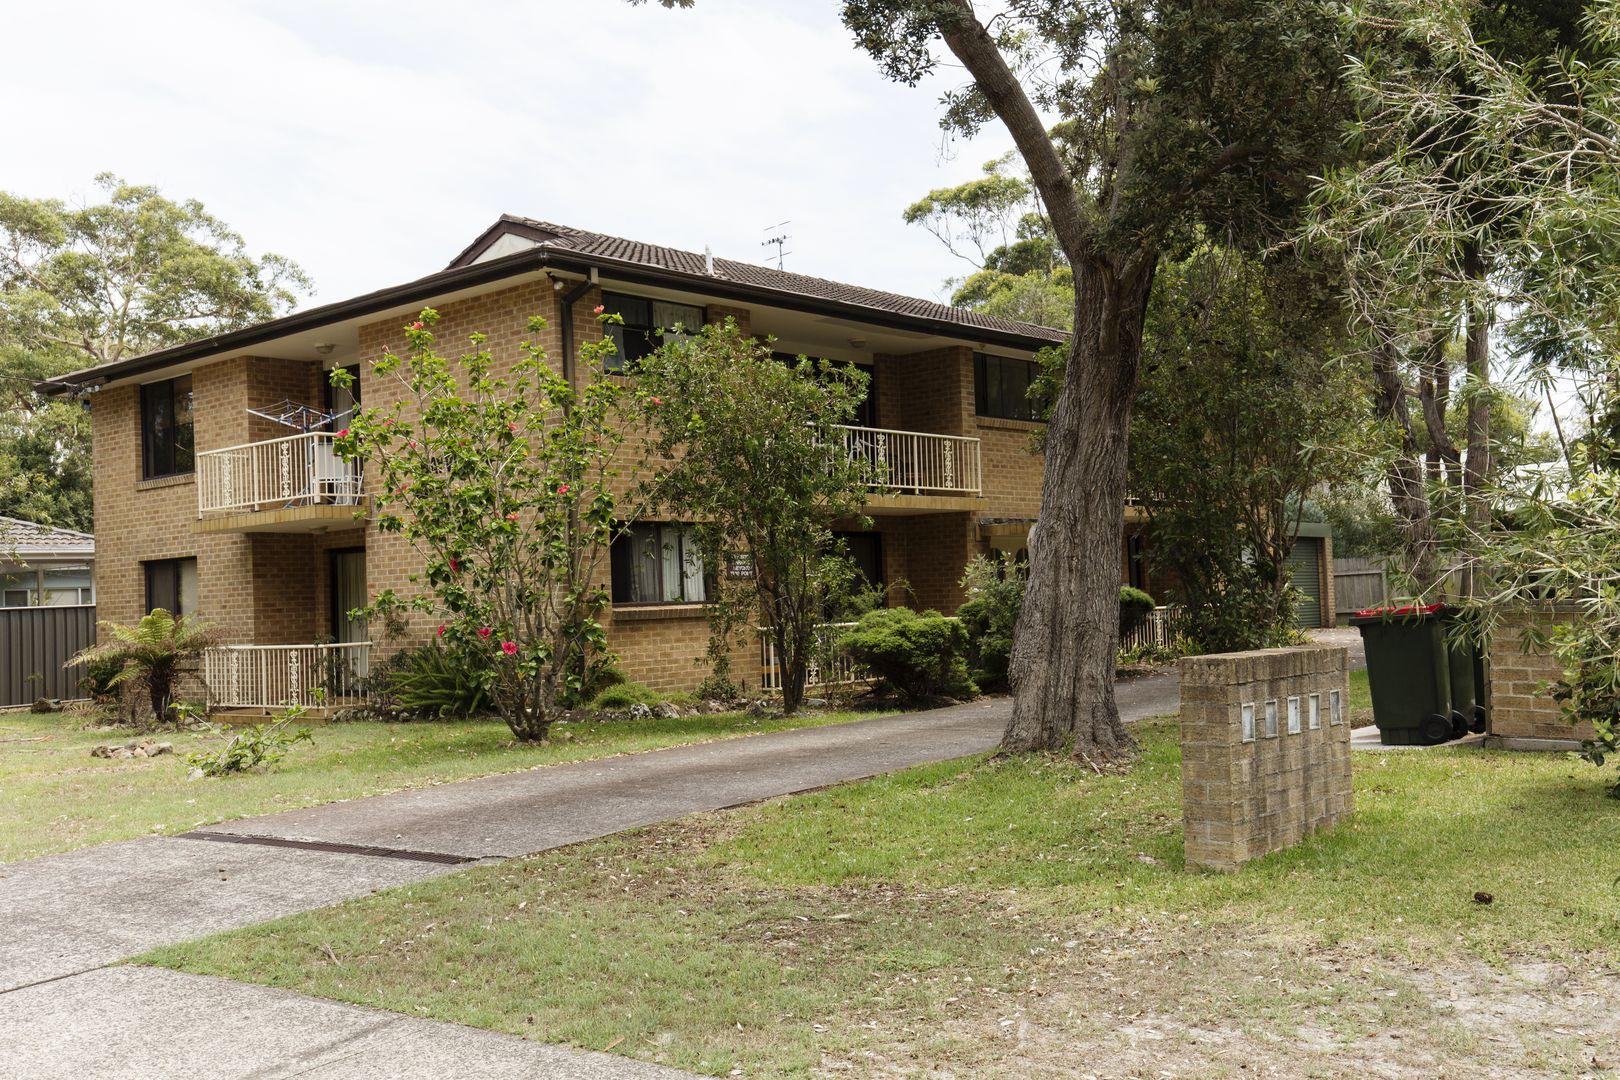 4/17 Coorilla Street, Hawks Nest NSW 2324, Image 1